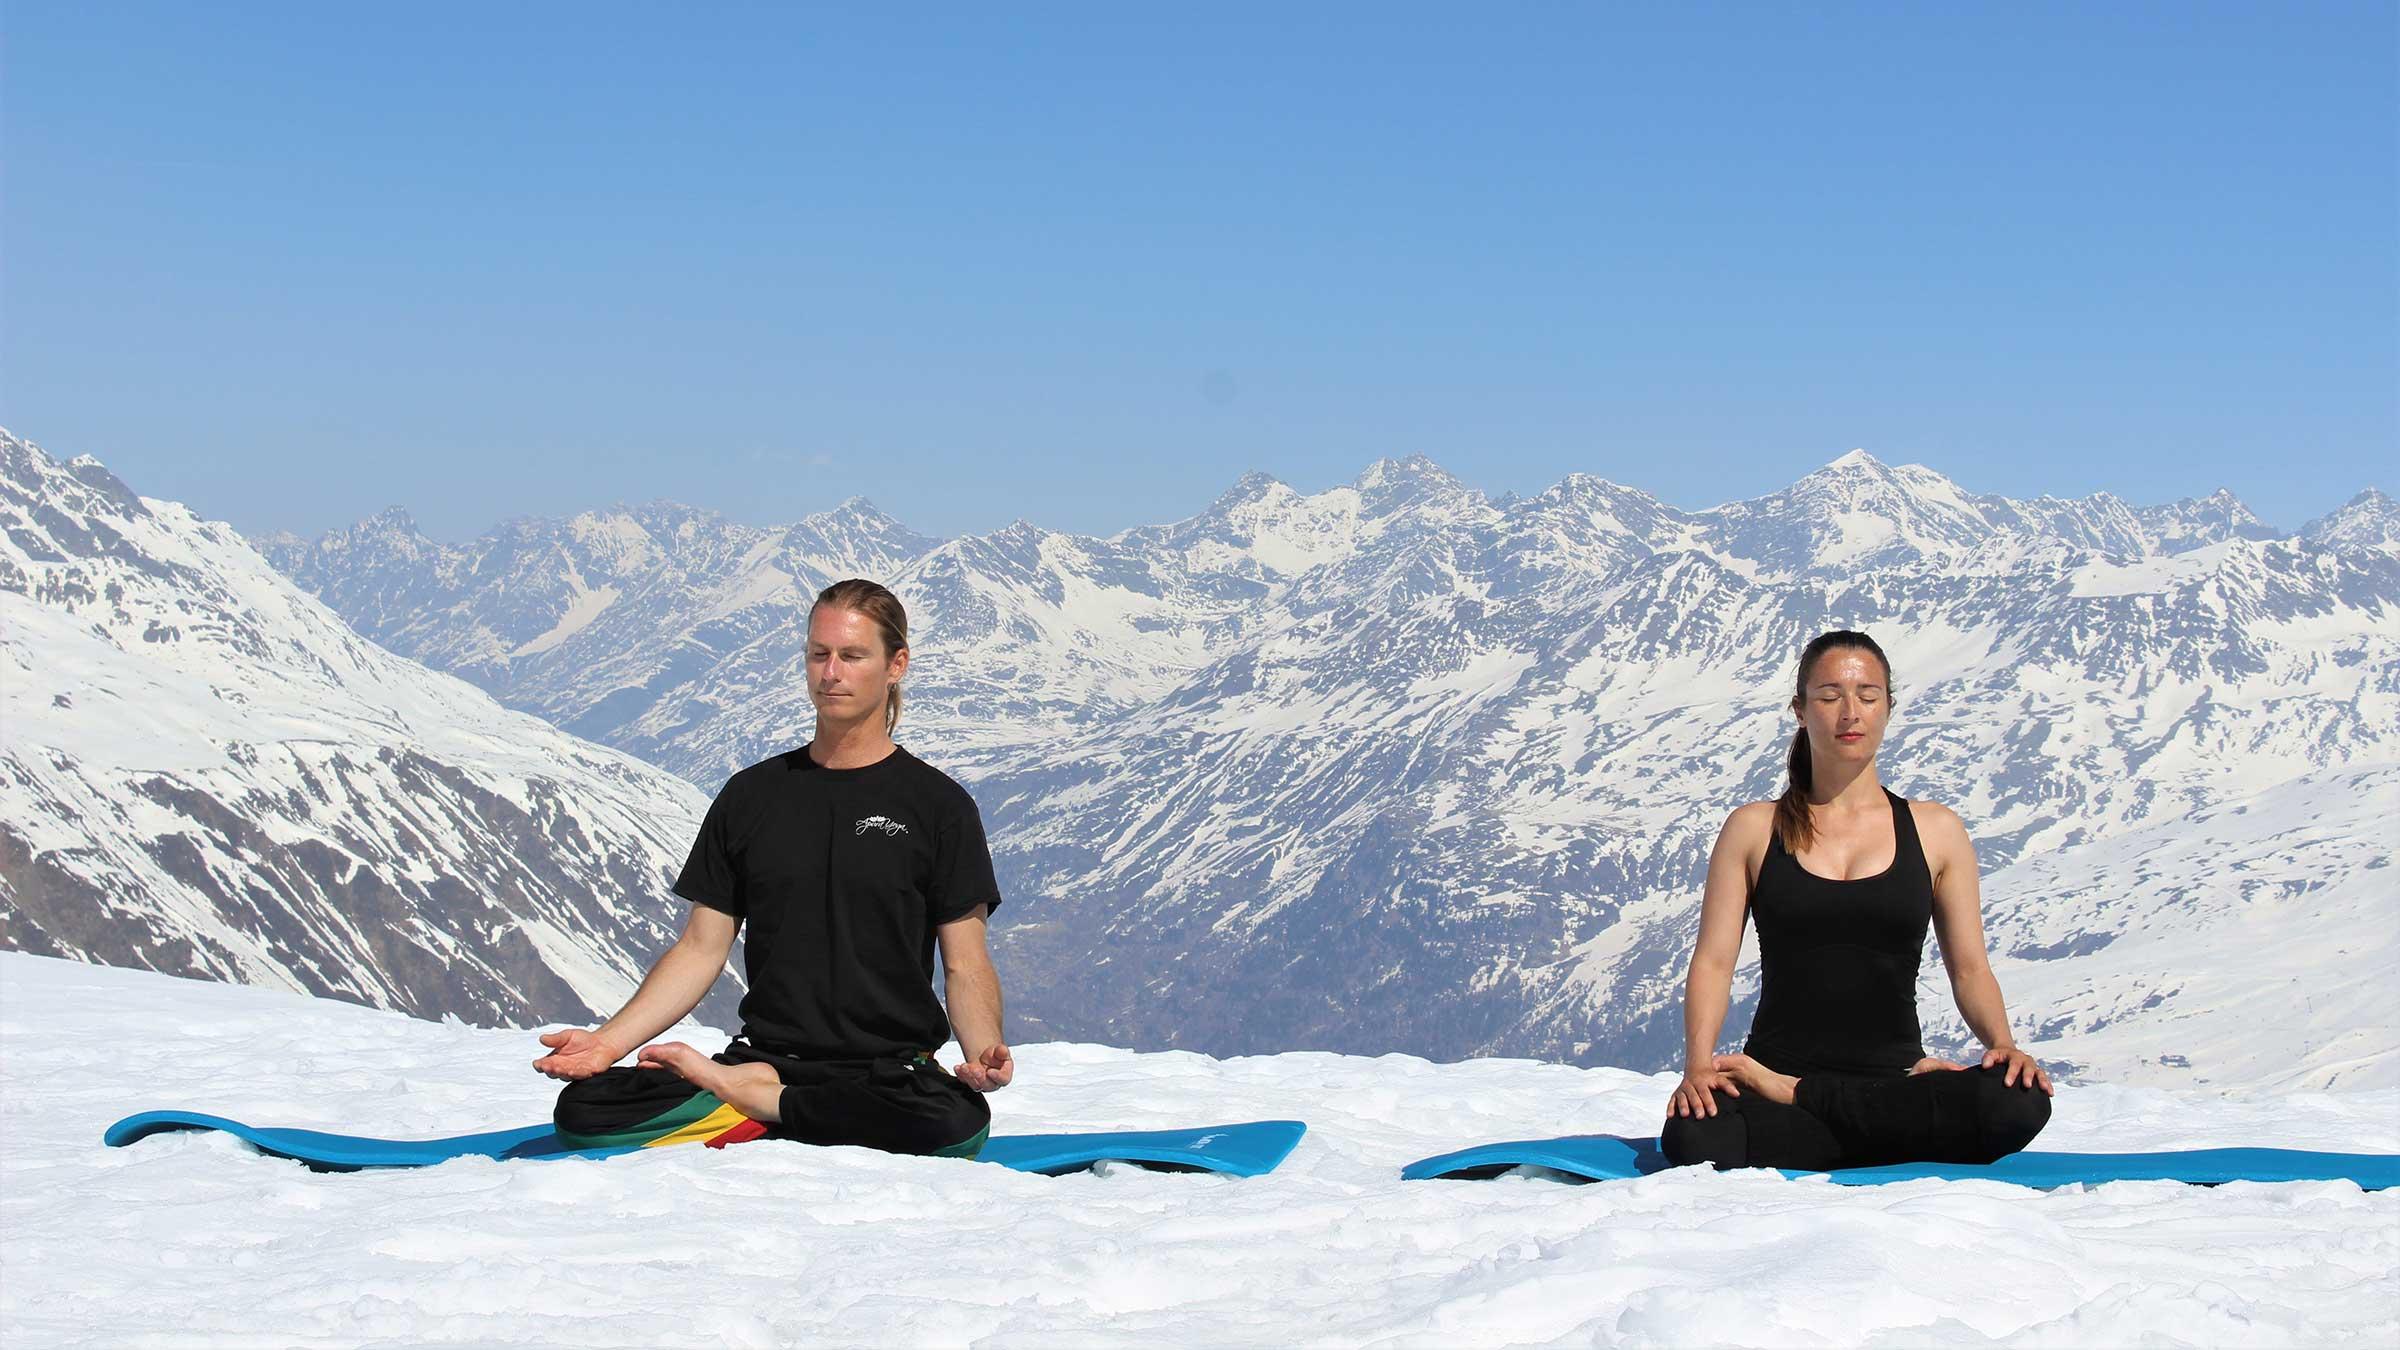 Schneidersitz vor Berglandschaft - Alpine Yoga mit Apura Yoga in Obergurgl